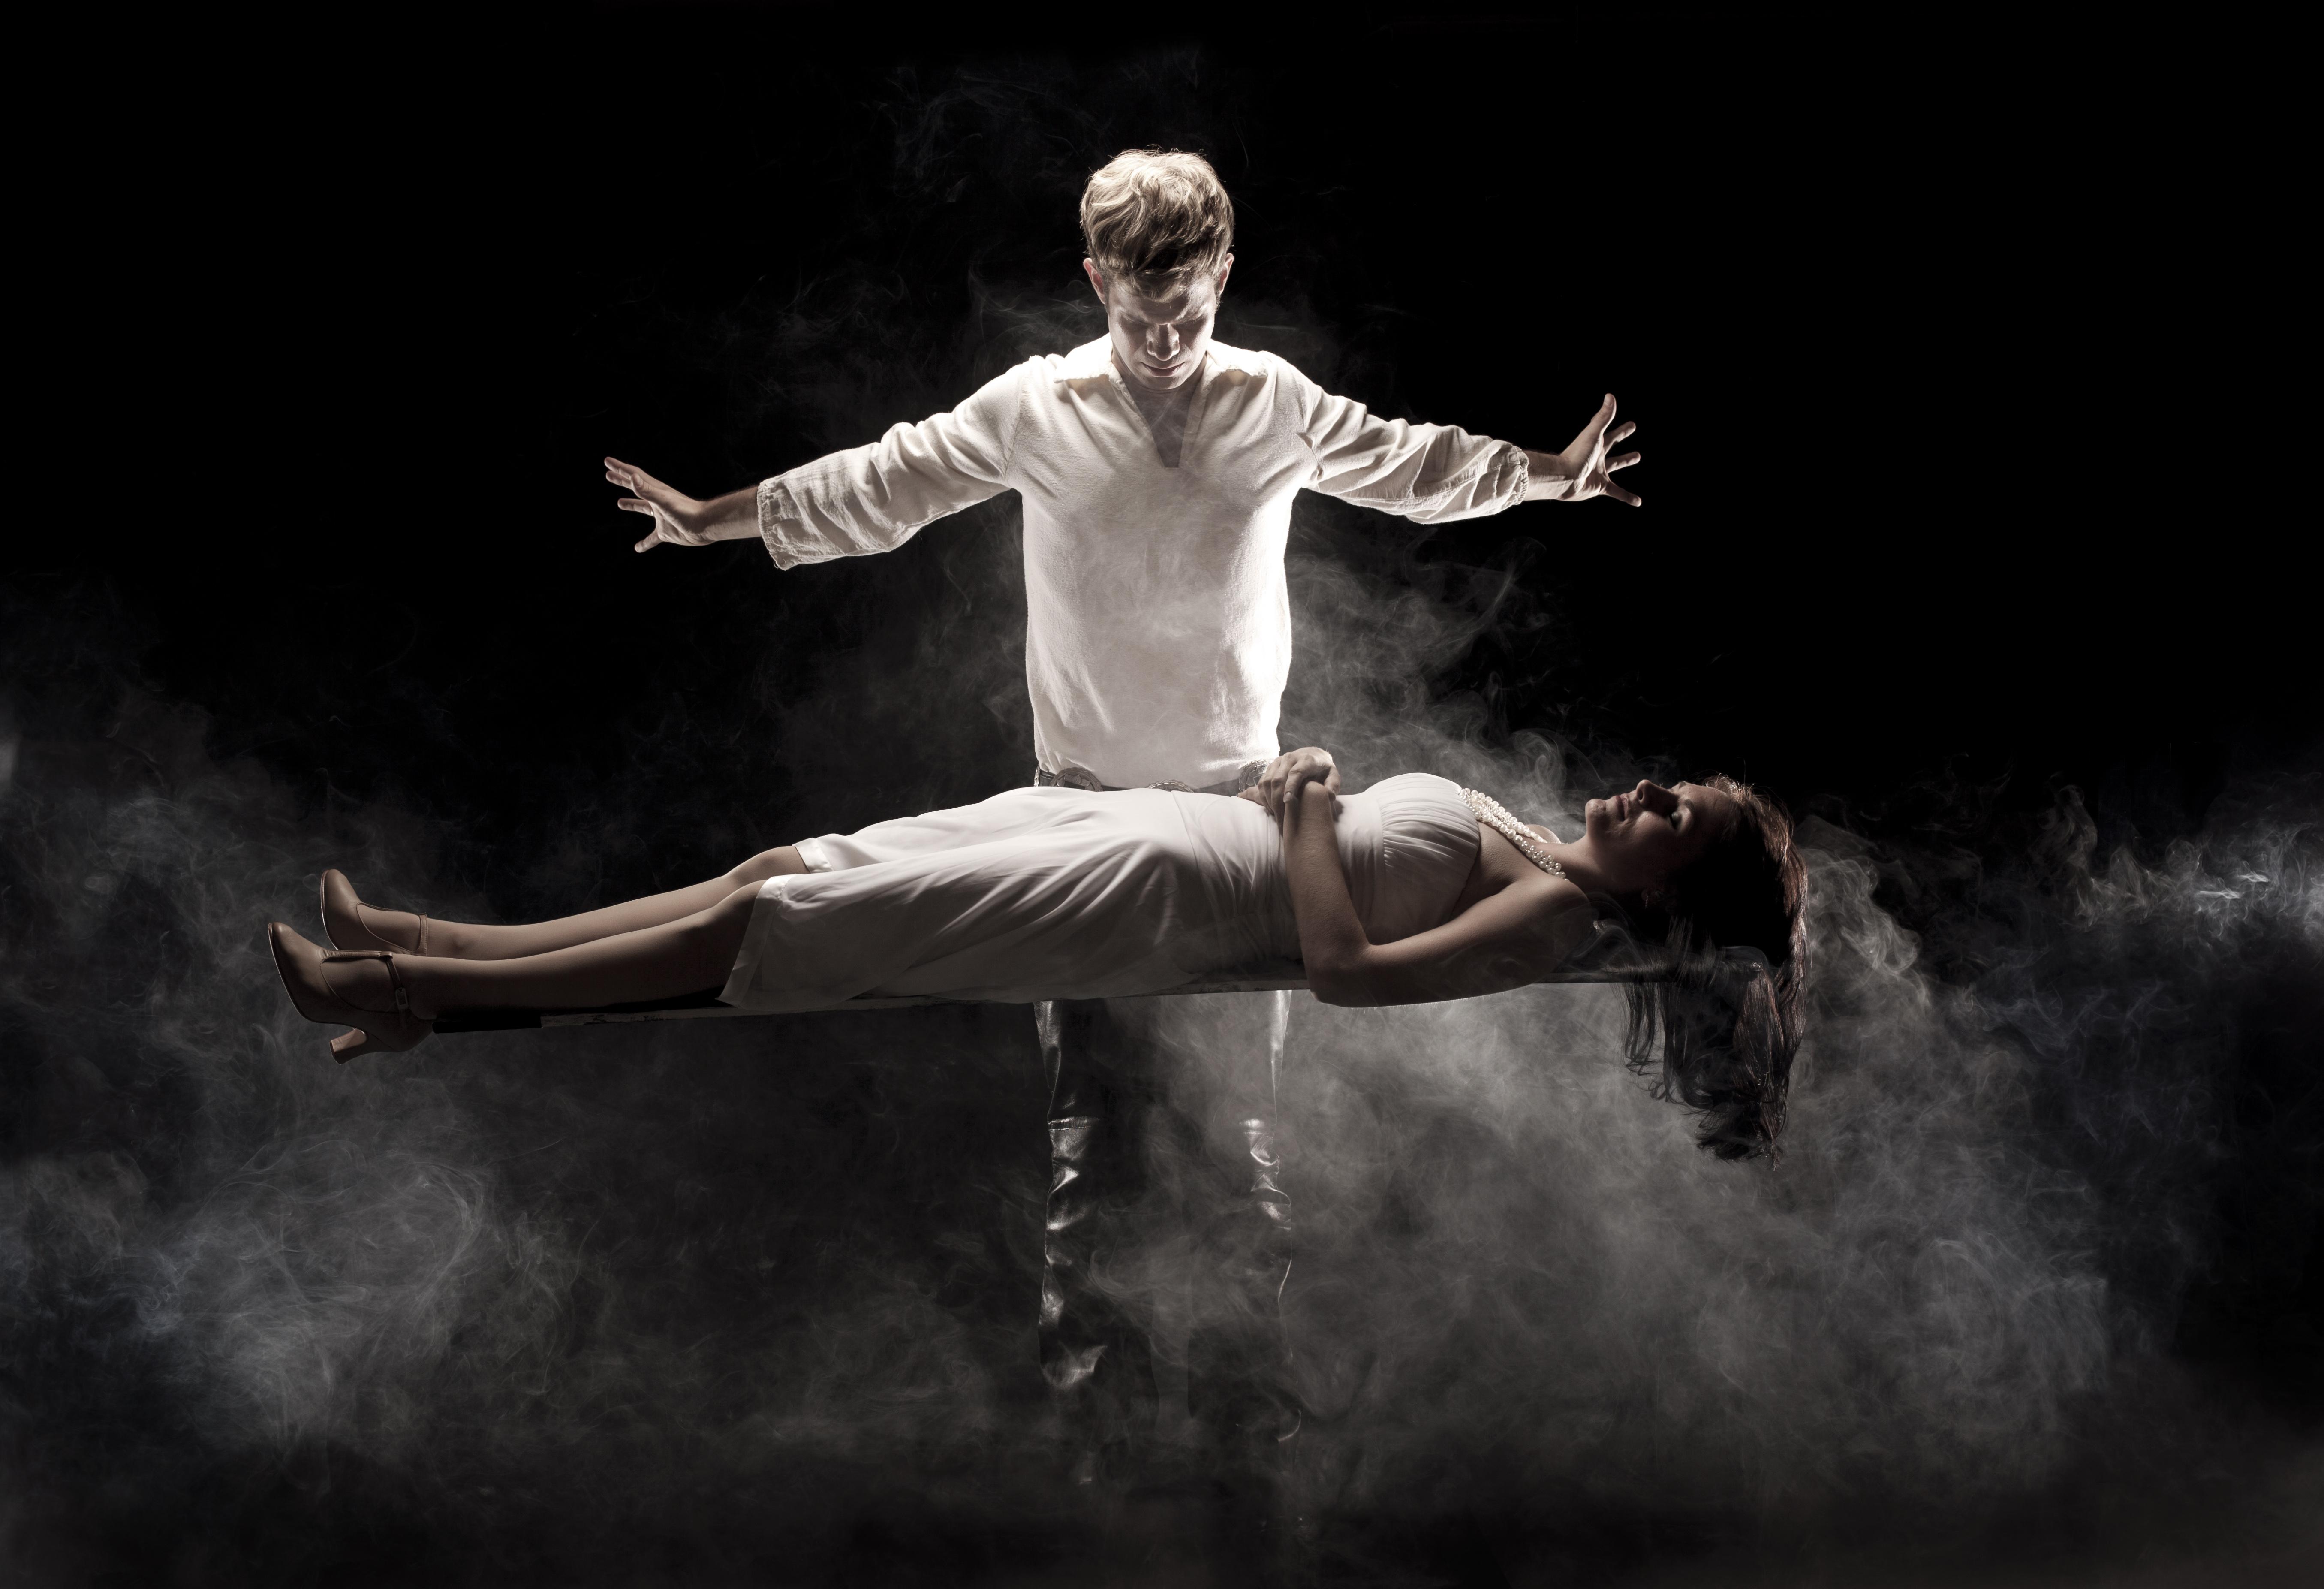 sammy-cortino-levitating-his-leading-lady-lyndsay-thomas_1.jpg